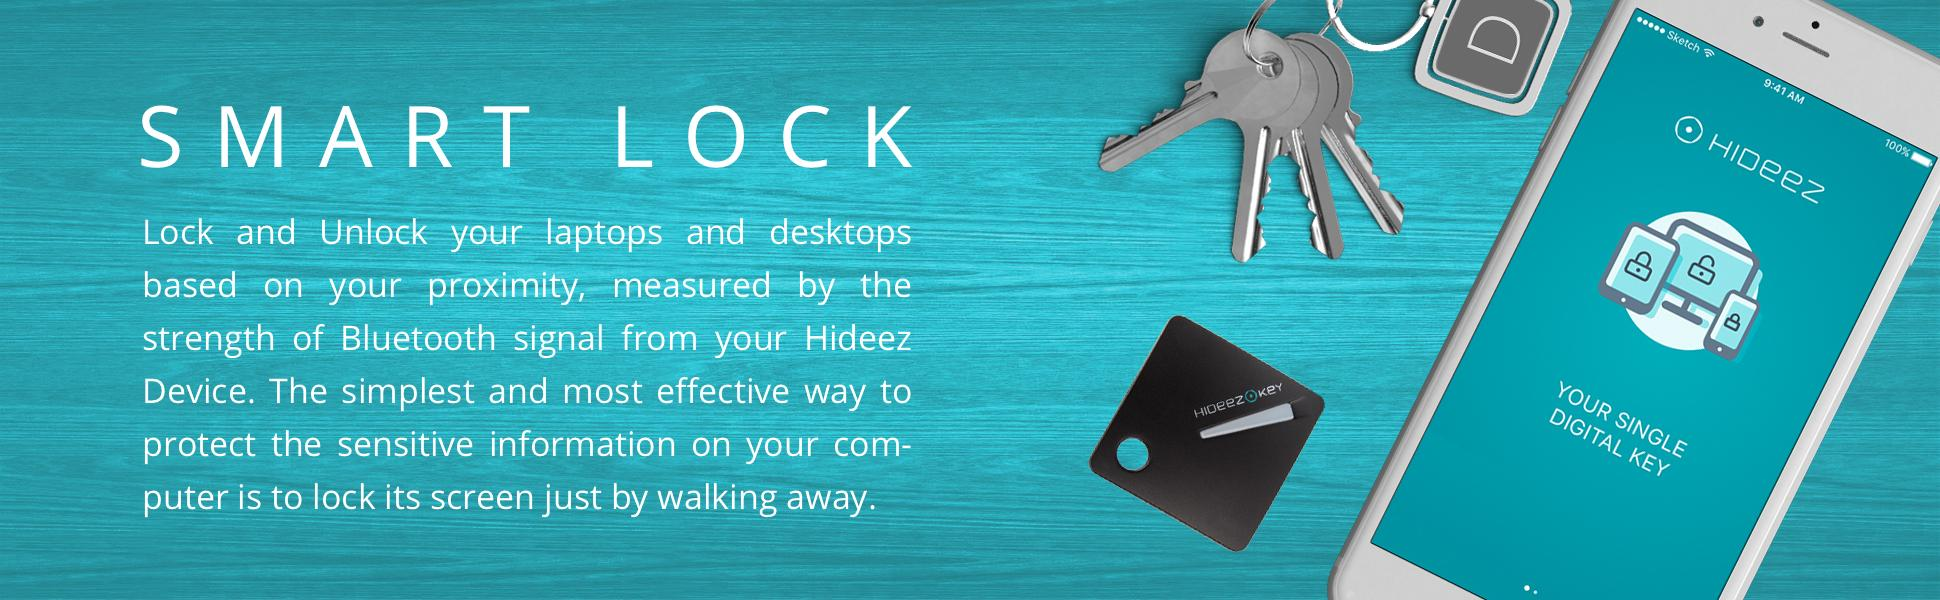 Amazon Com Hideez Key Bluetooth Password Manager Amp Vault